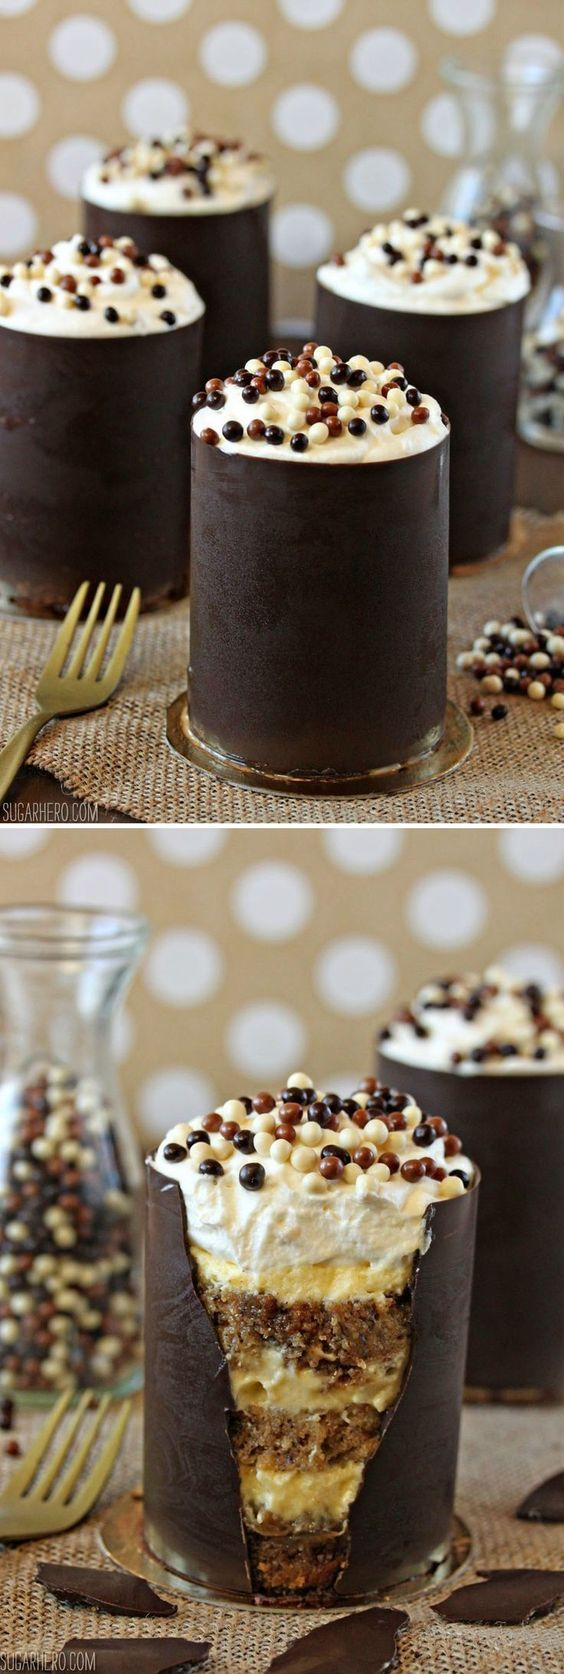 Banana Bread Tiramisu, in an edible chocolate shell! | From SugarHero.com